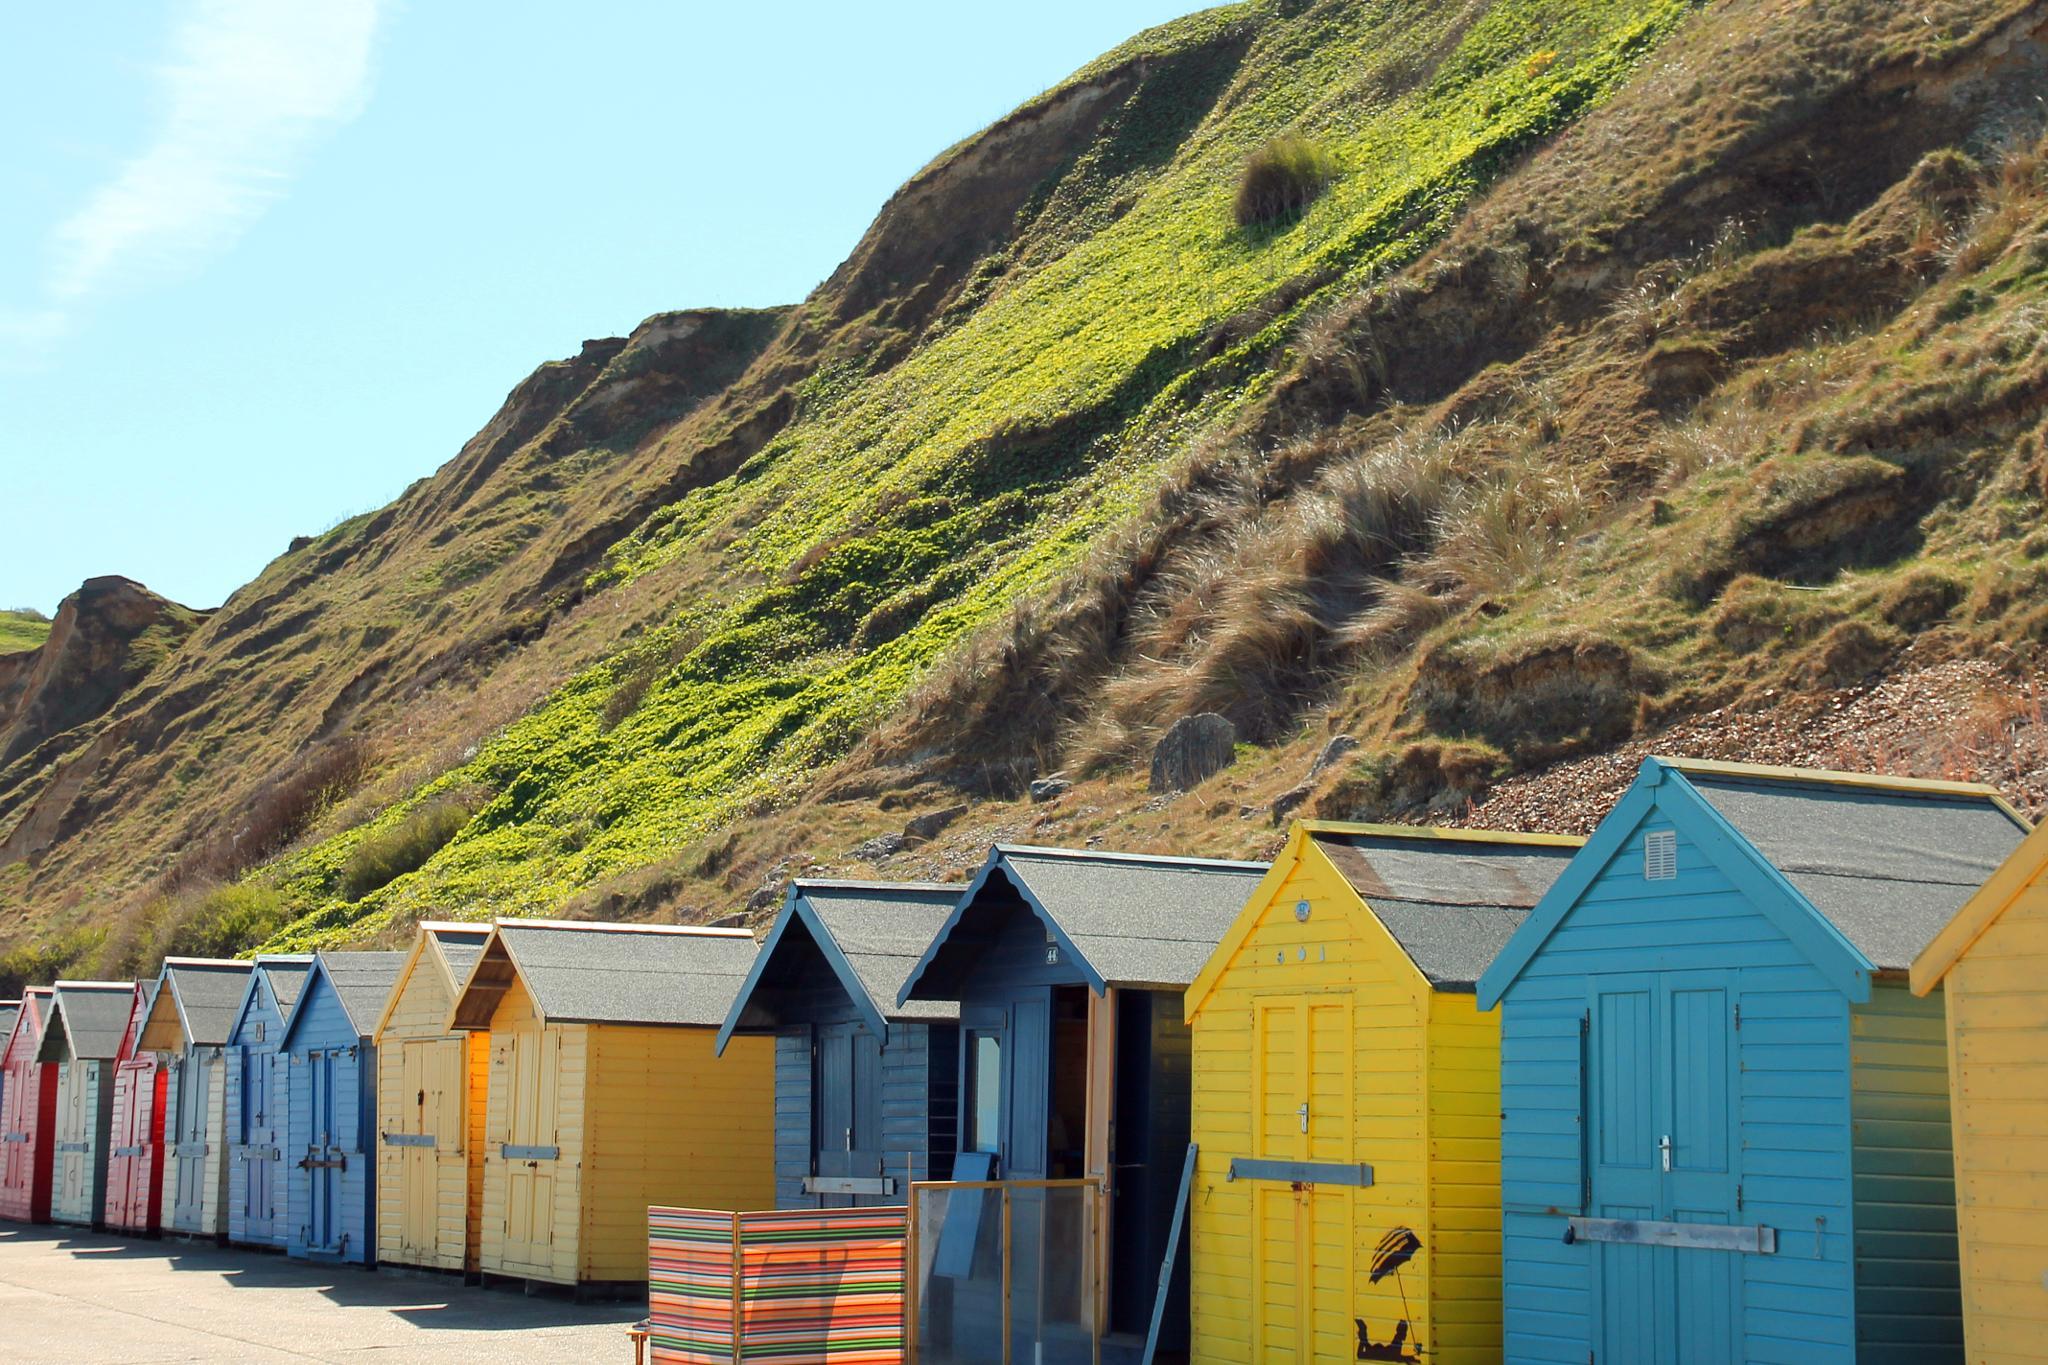 Beach Huts by Martin Roper